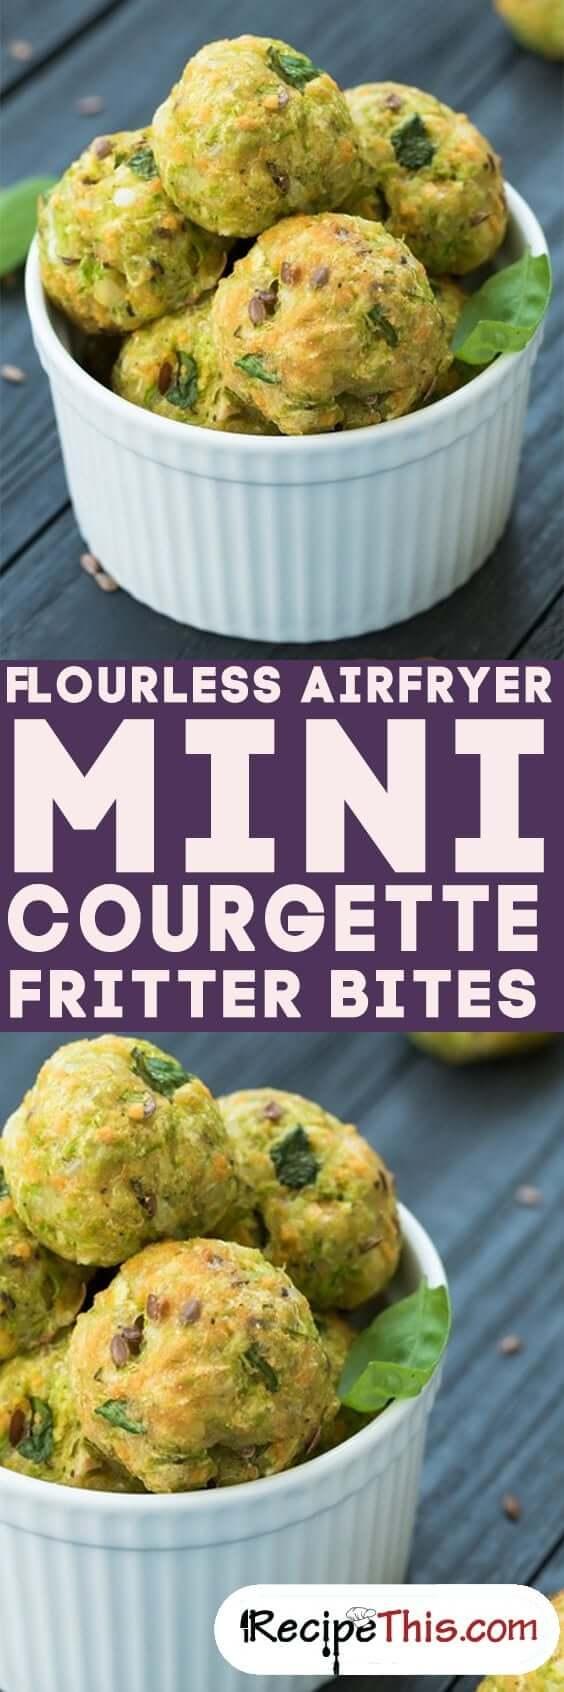 Flourless Air Fryer Mini Courgette Fritter Bites